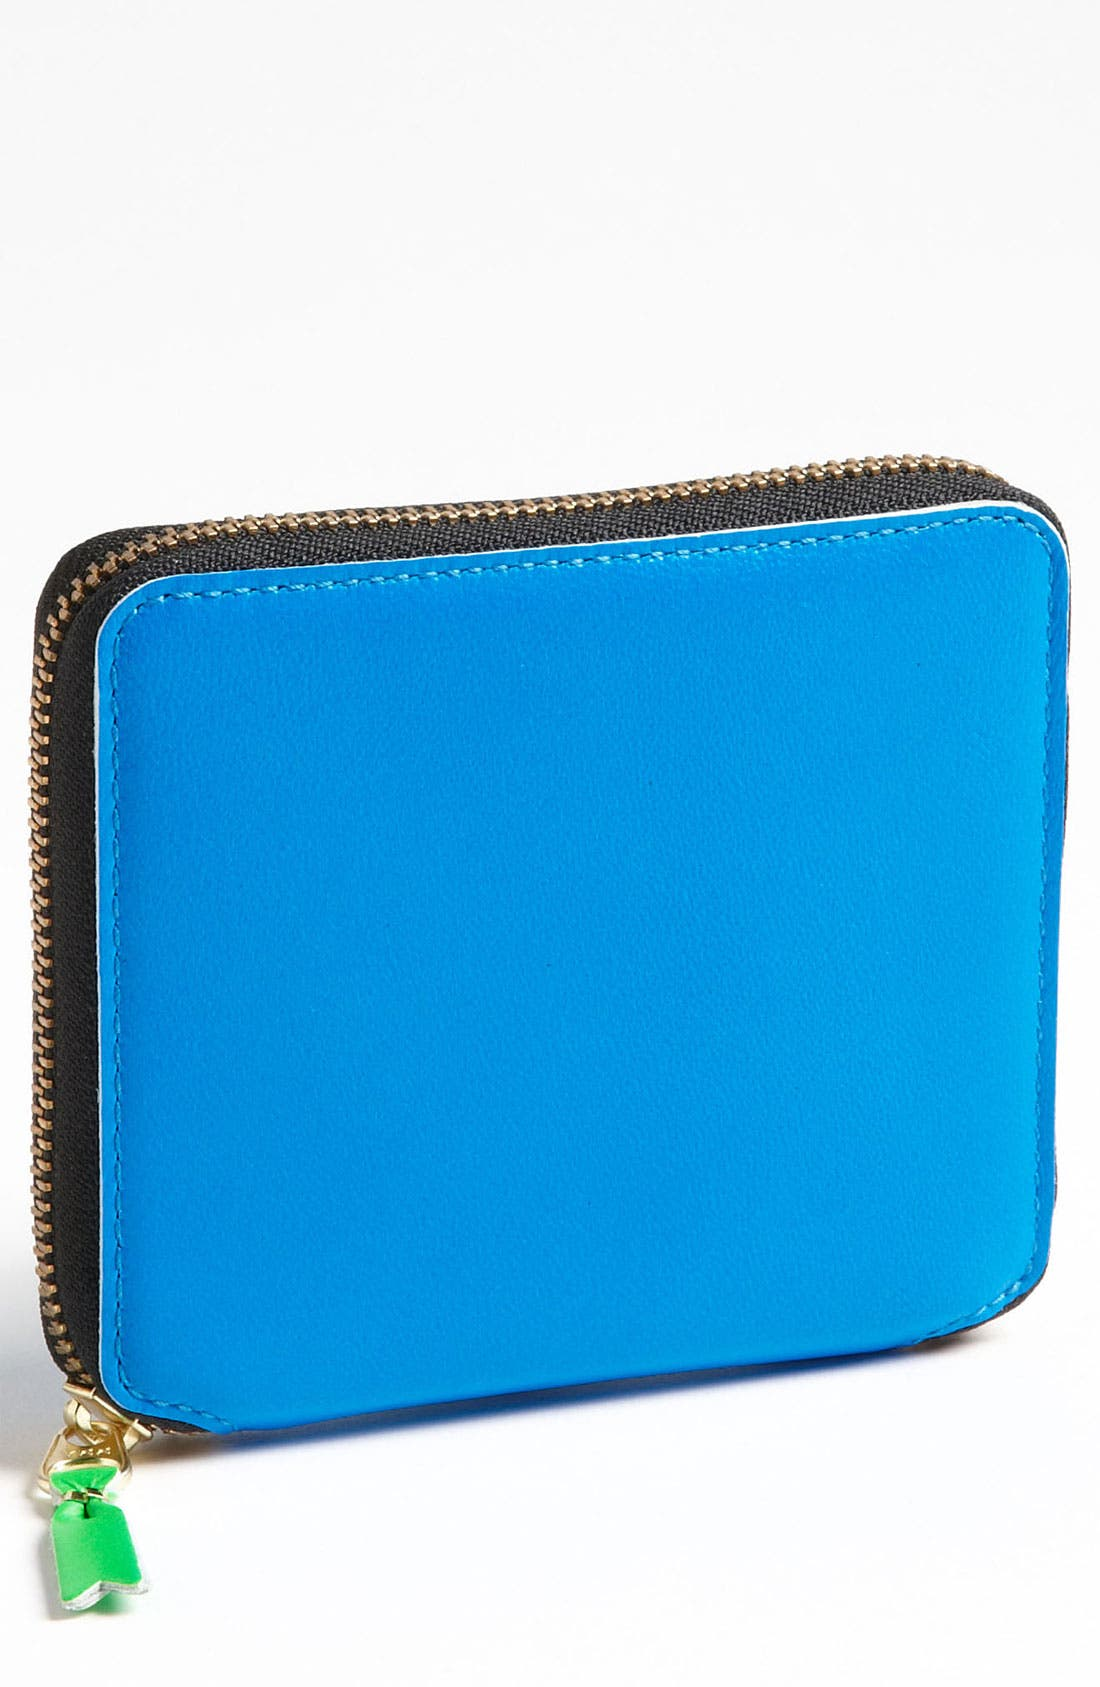 Alternate Image 1 Selected - Comme des Garçons 'Super Fluo' Zip Around Wallet